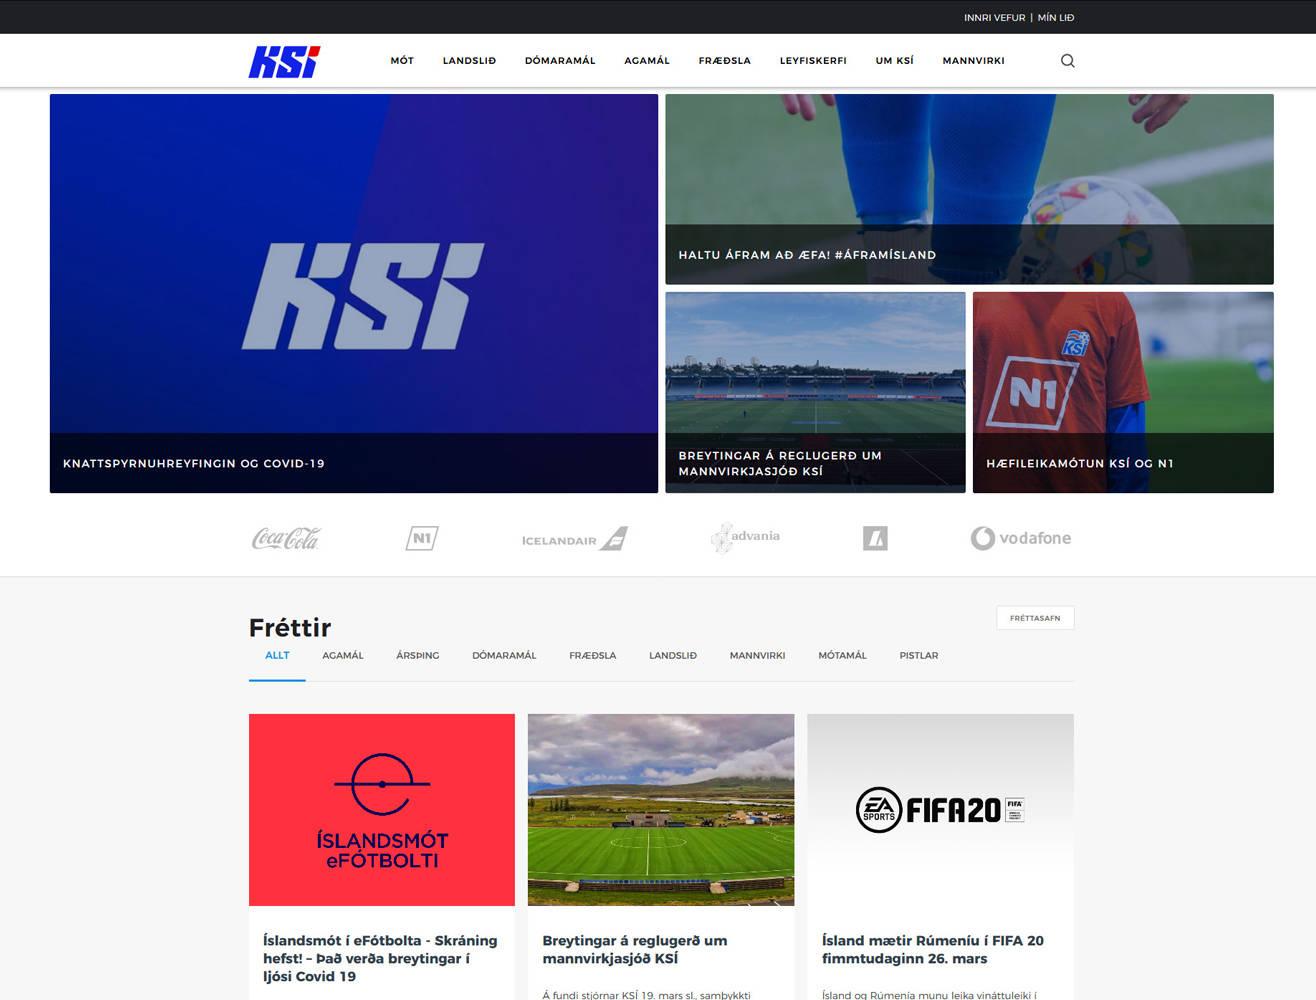 Football Association of Iceland (KSI)